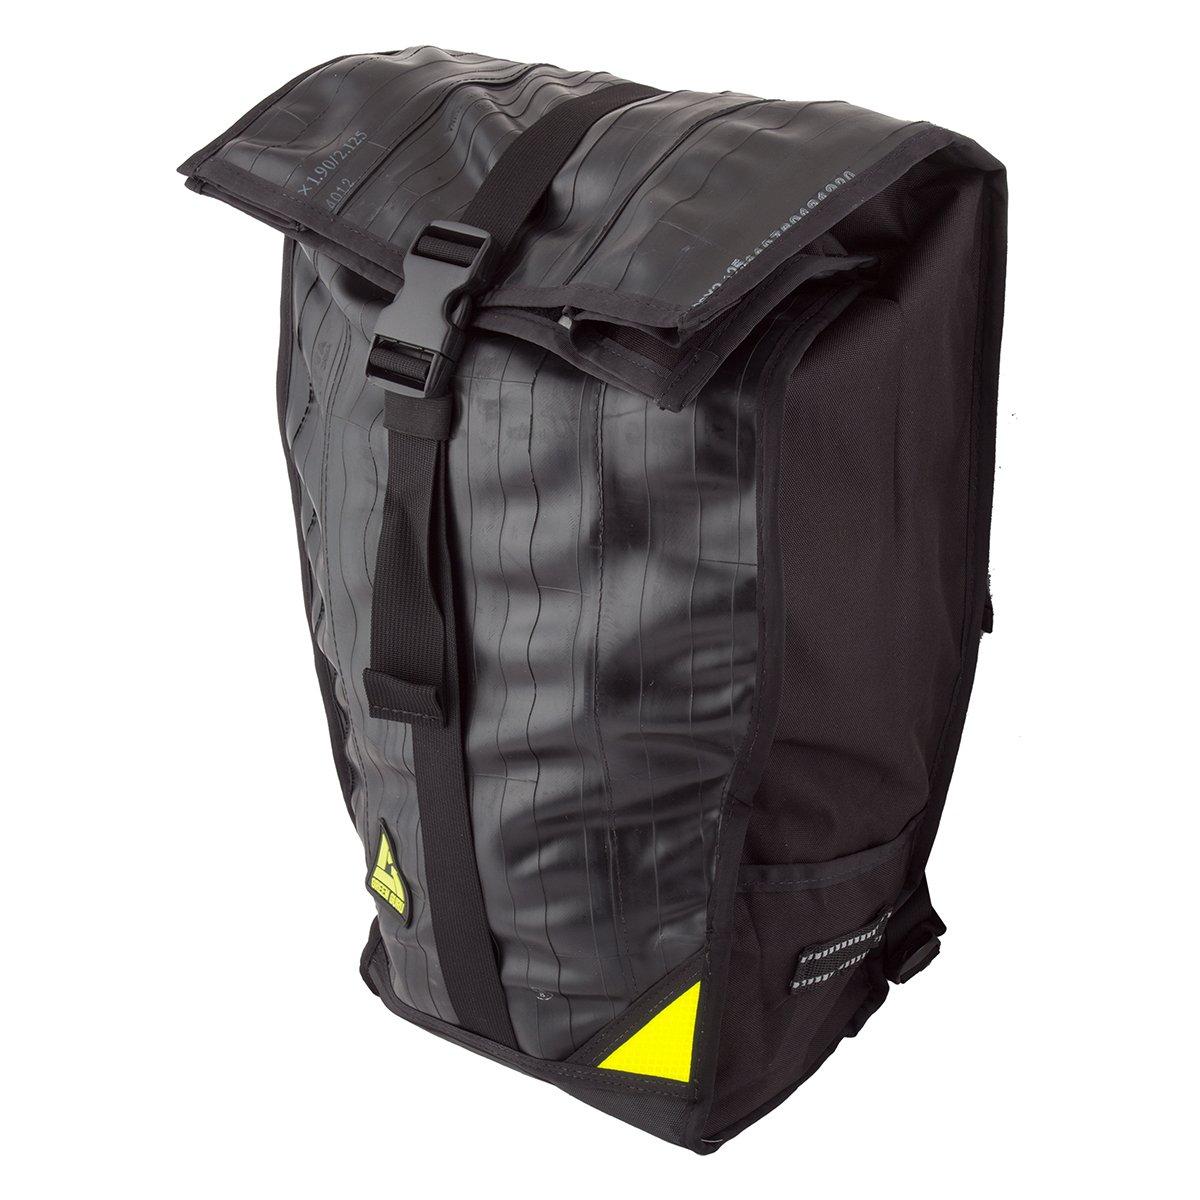 Bag Greenguru Pannier & Backpack High Roller by Green Guru Gear B0186ONRQA